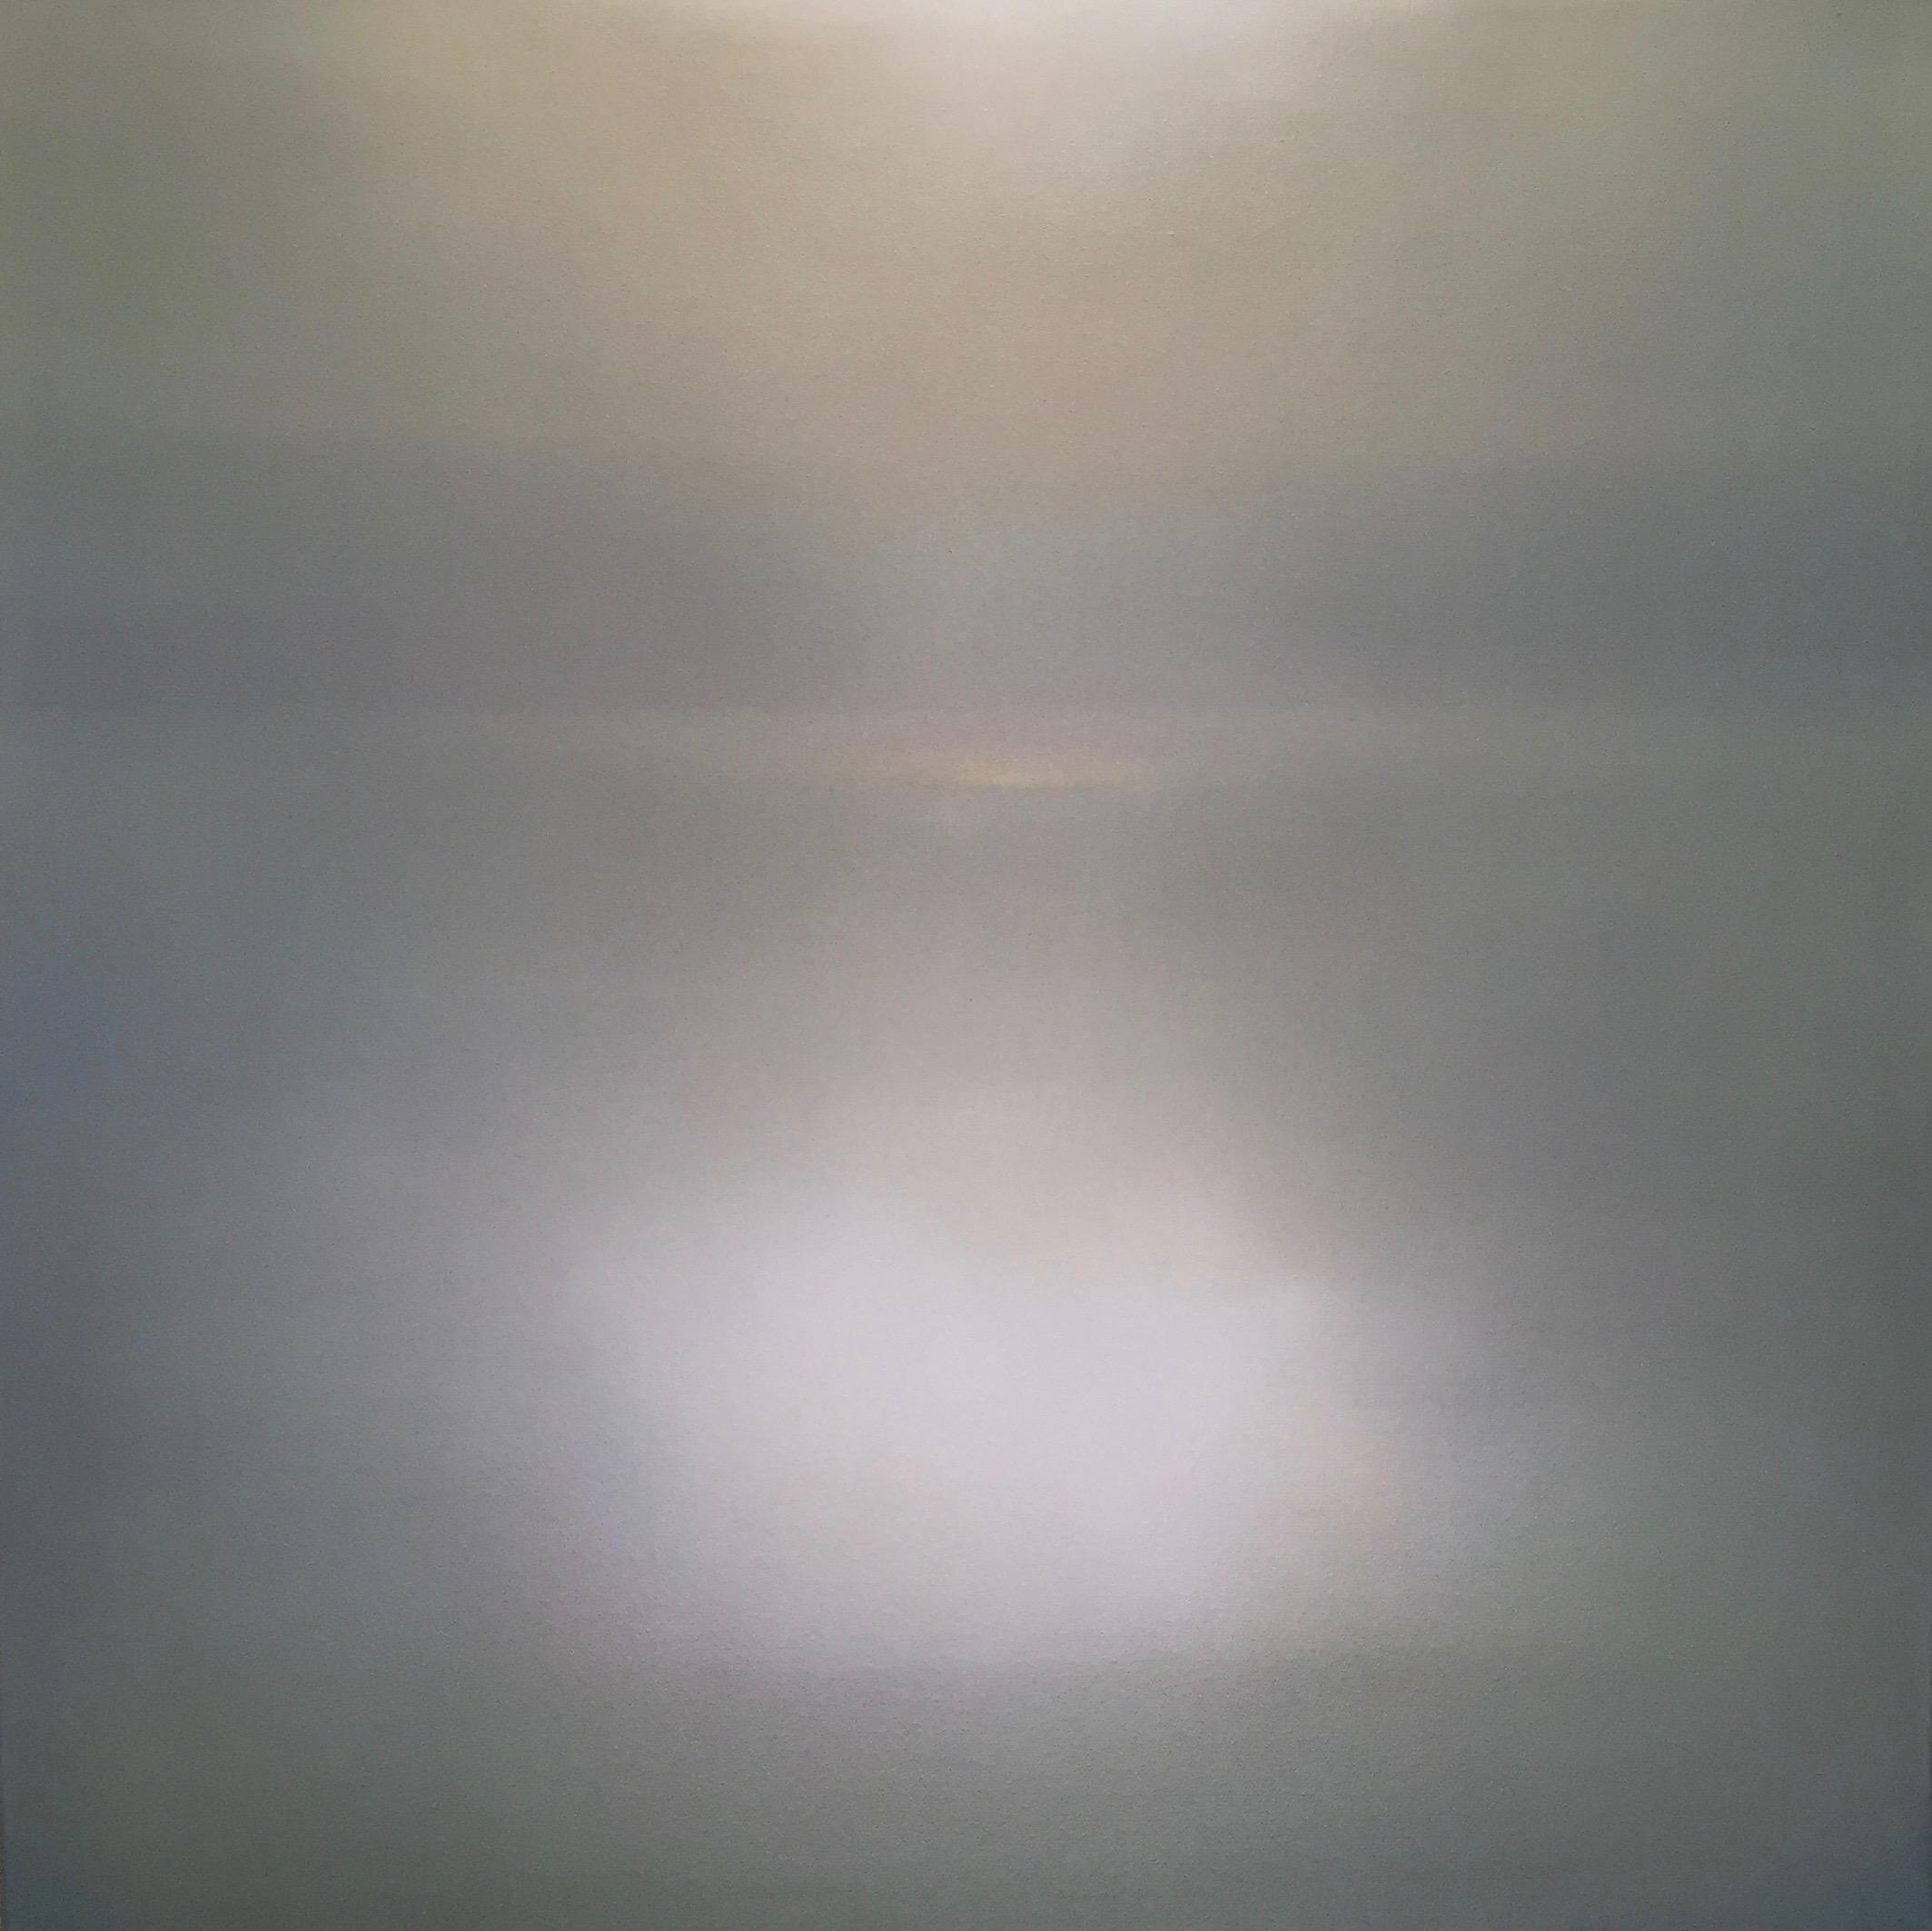 Light V, 2017, Oil on Canvas, 36 x 36